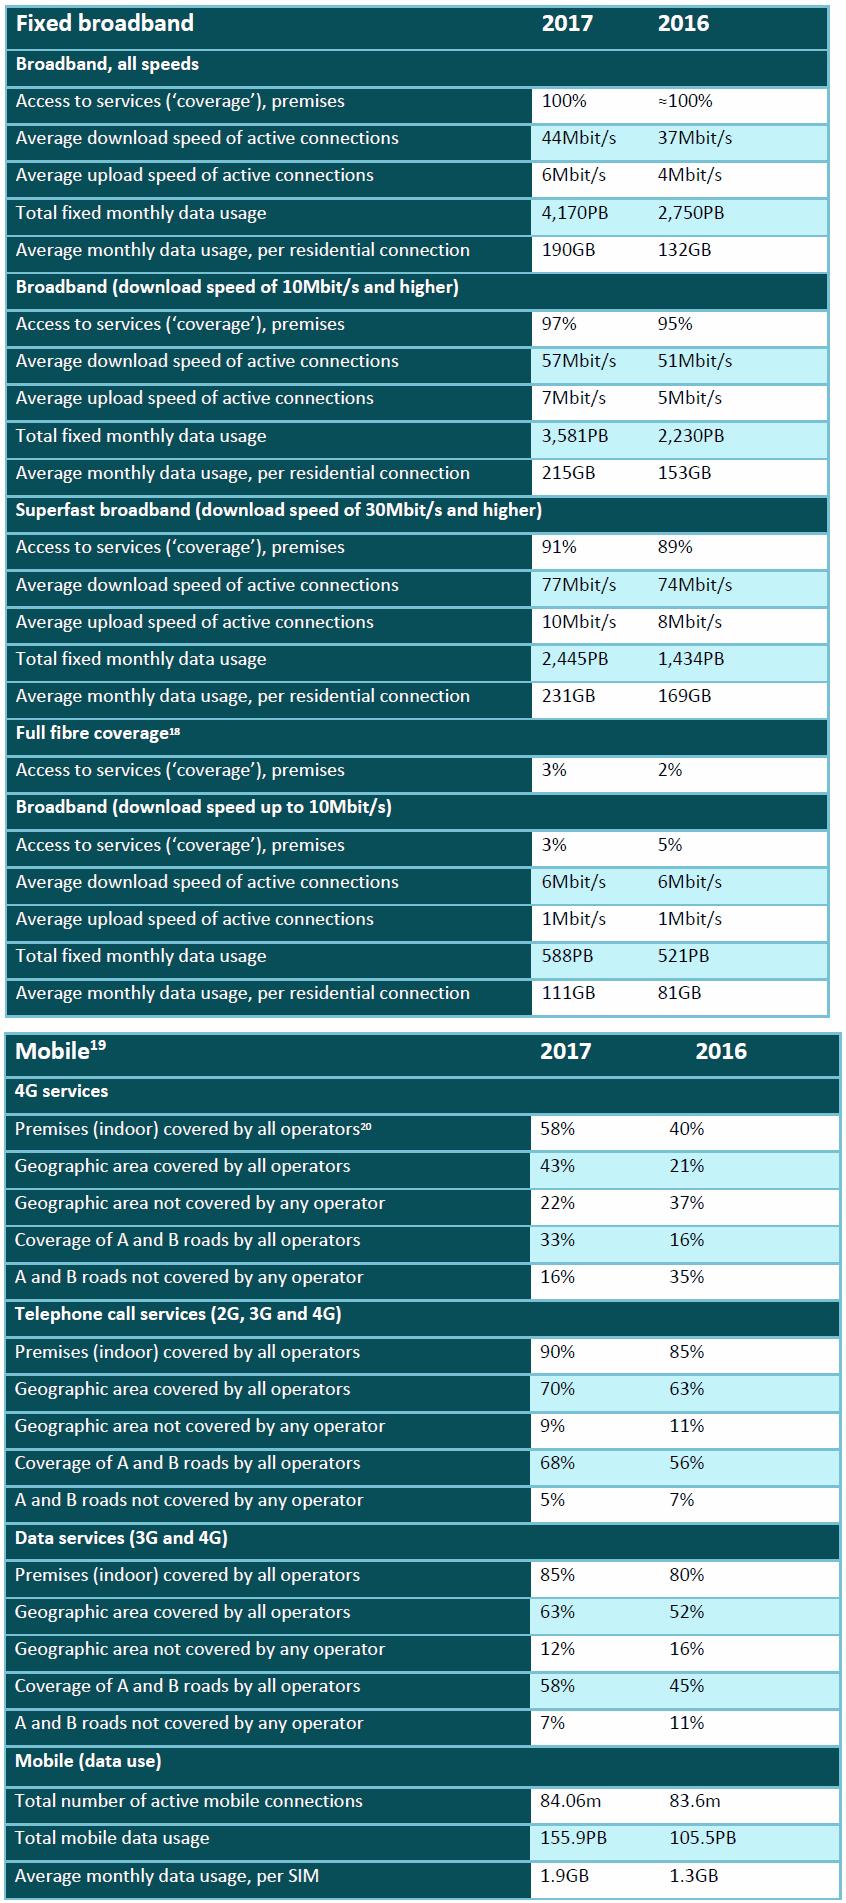 ofcom_uk_broadband_and_mobile_stats_2017